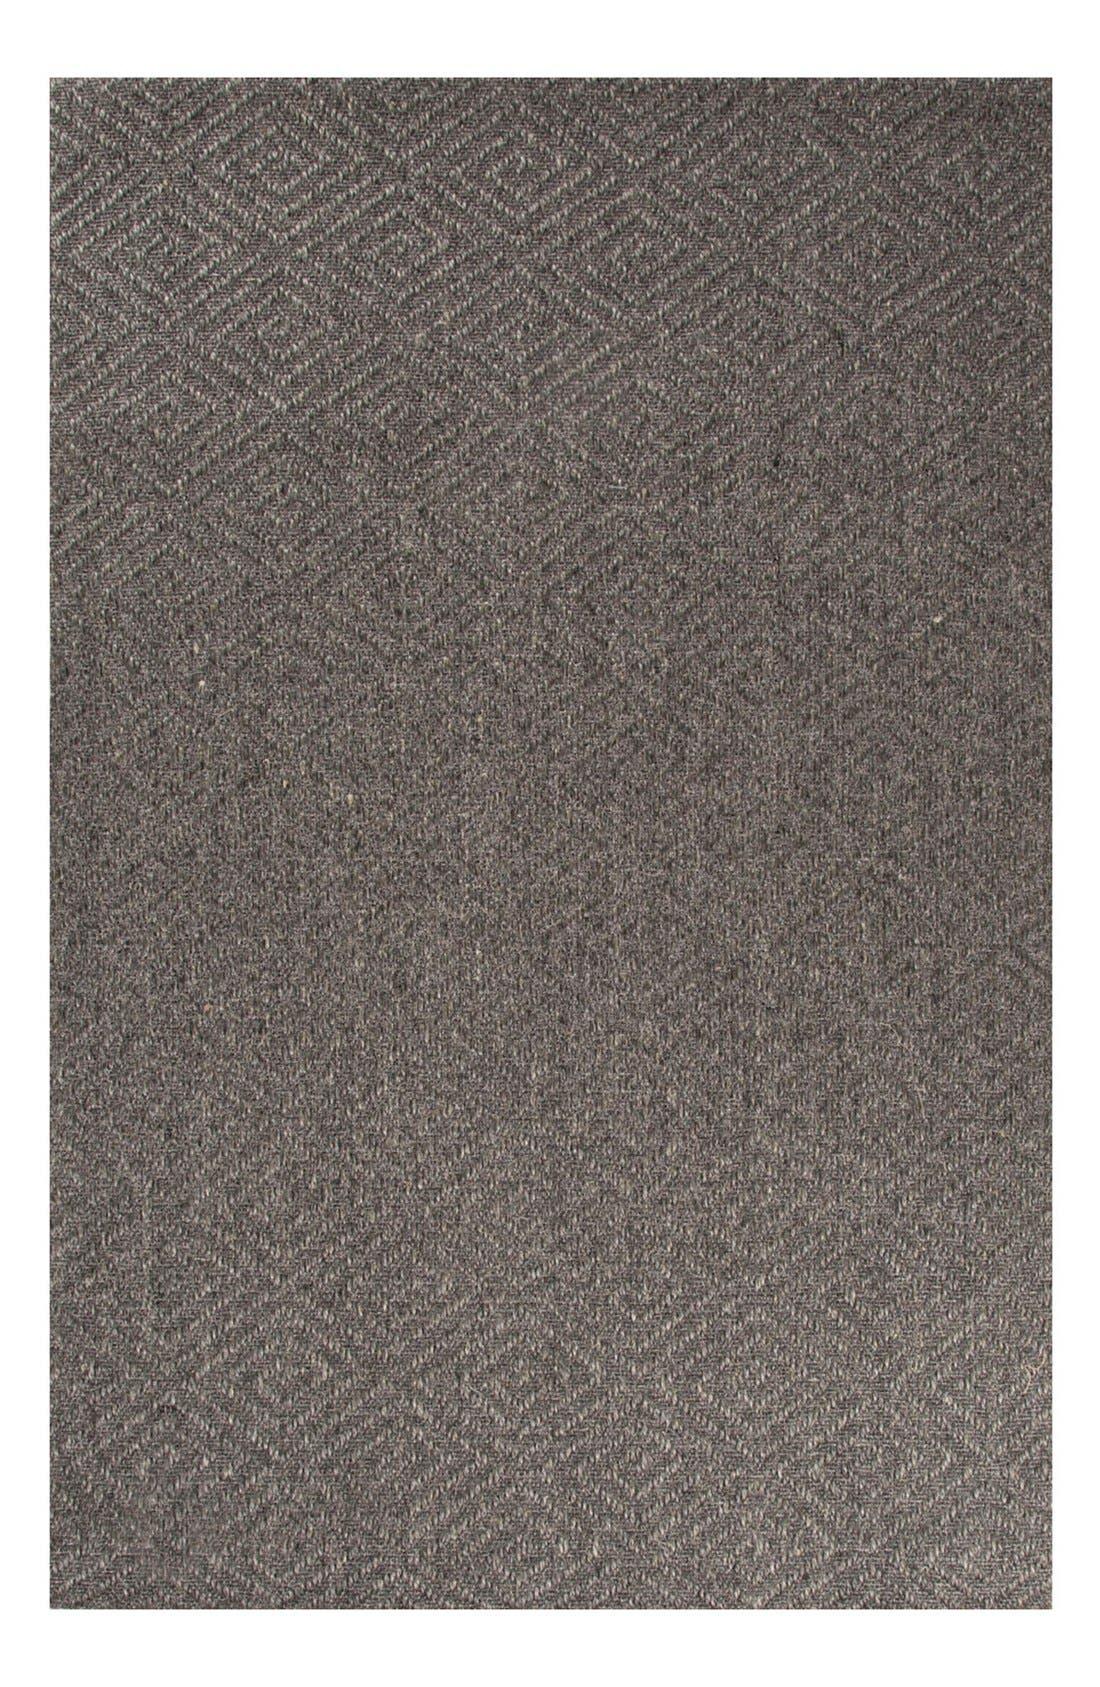 'Tobago Naturals' Hand Woven Rug,                         Main,                         color, 025